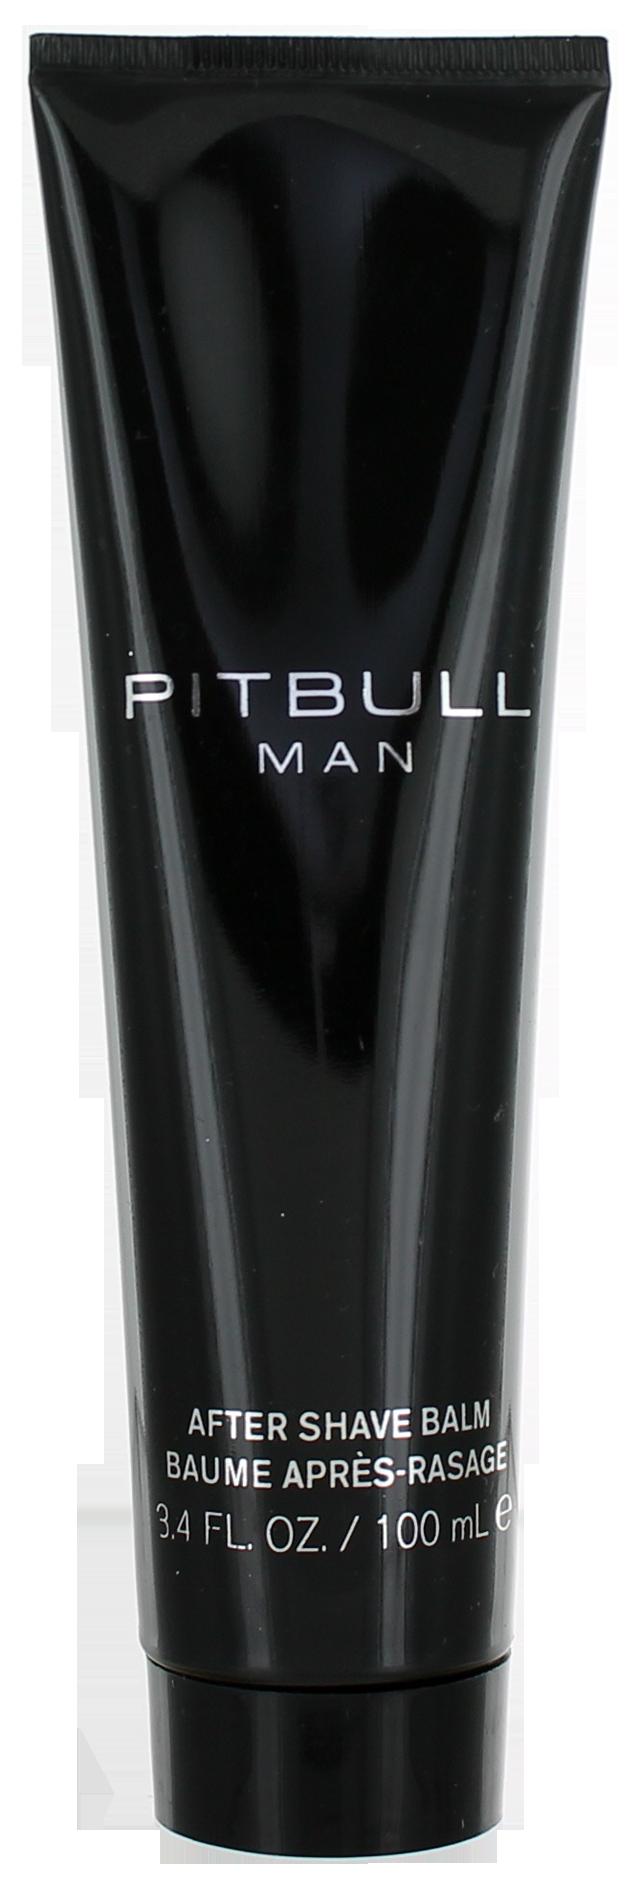 Pitbull Man (M) After Shave Balm 3.4oz